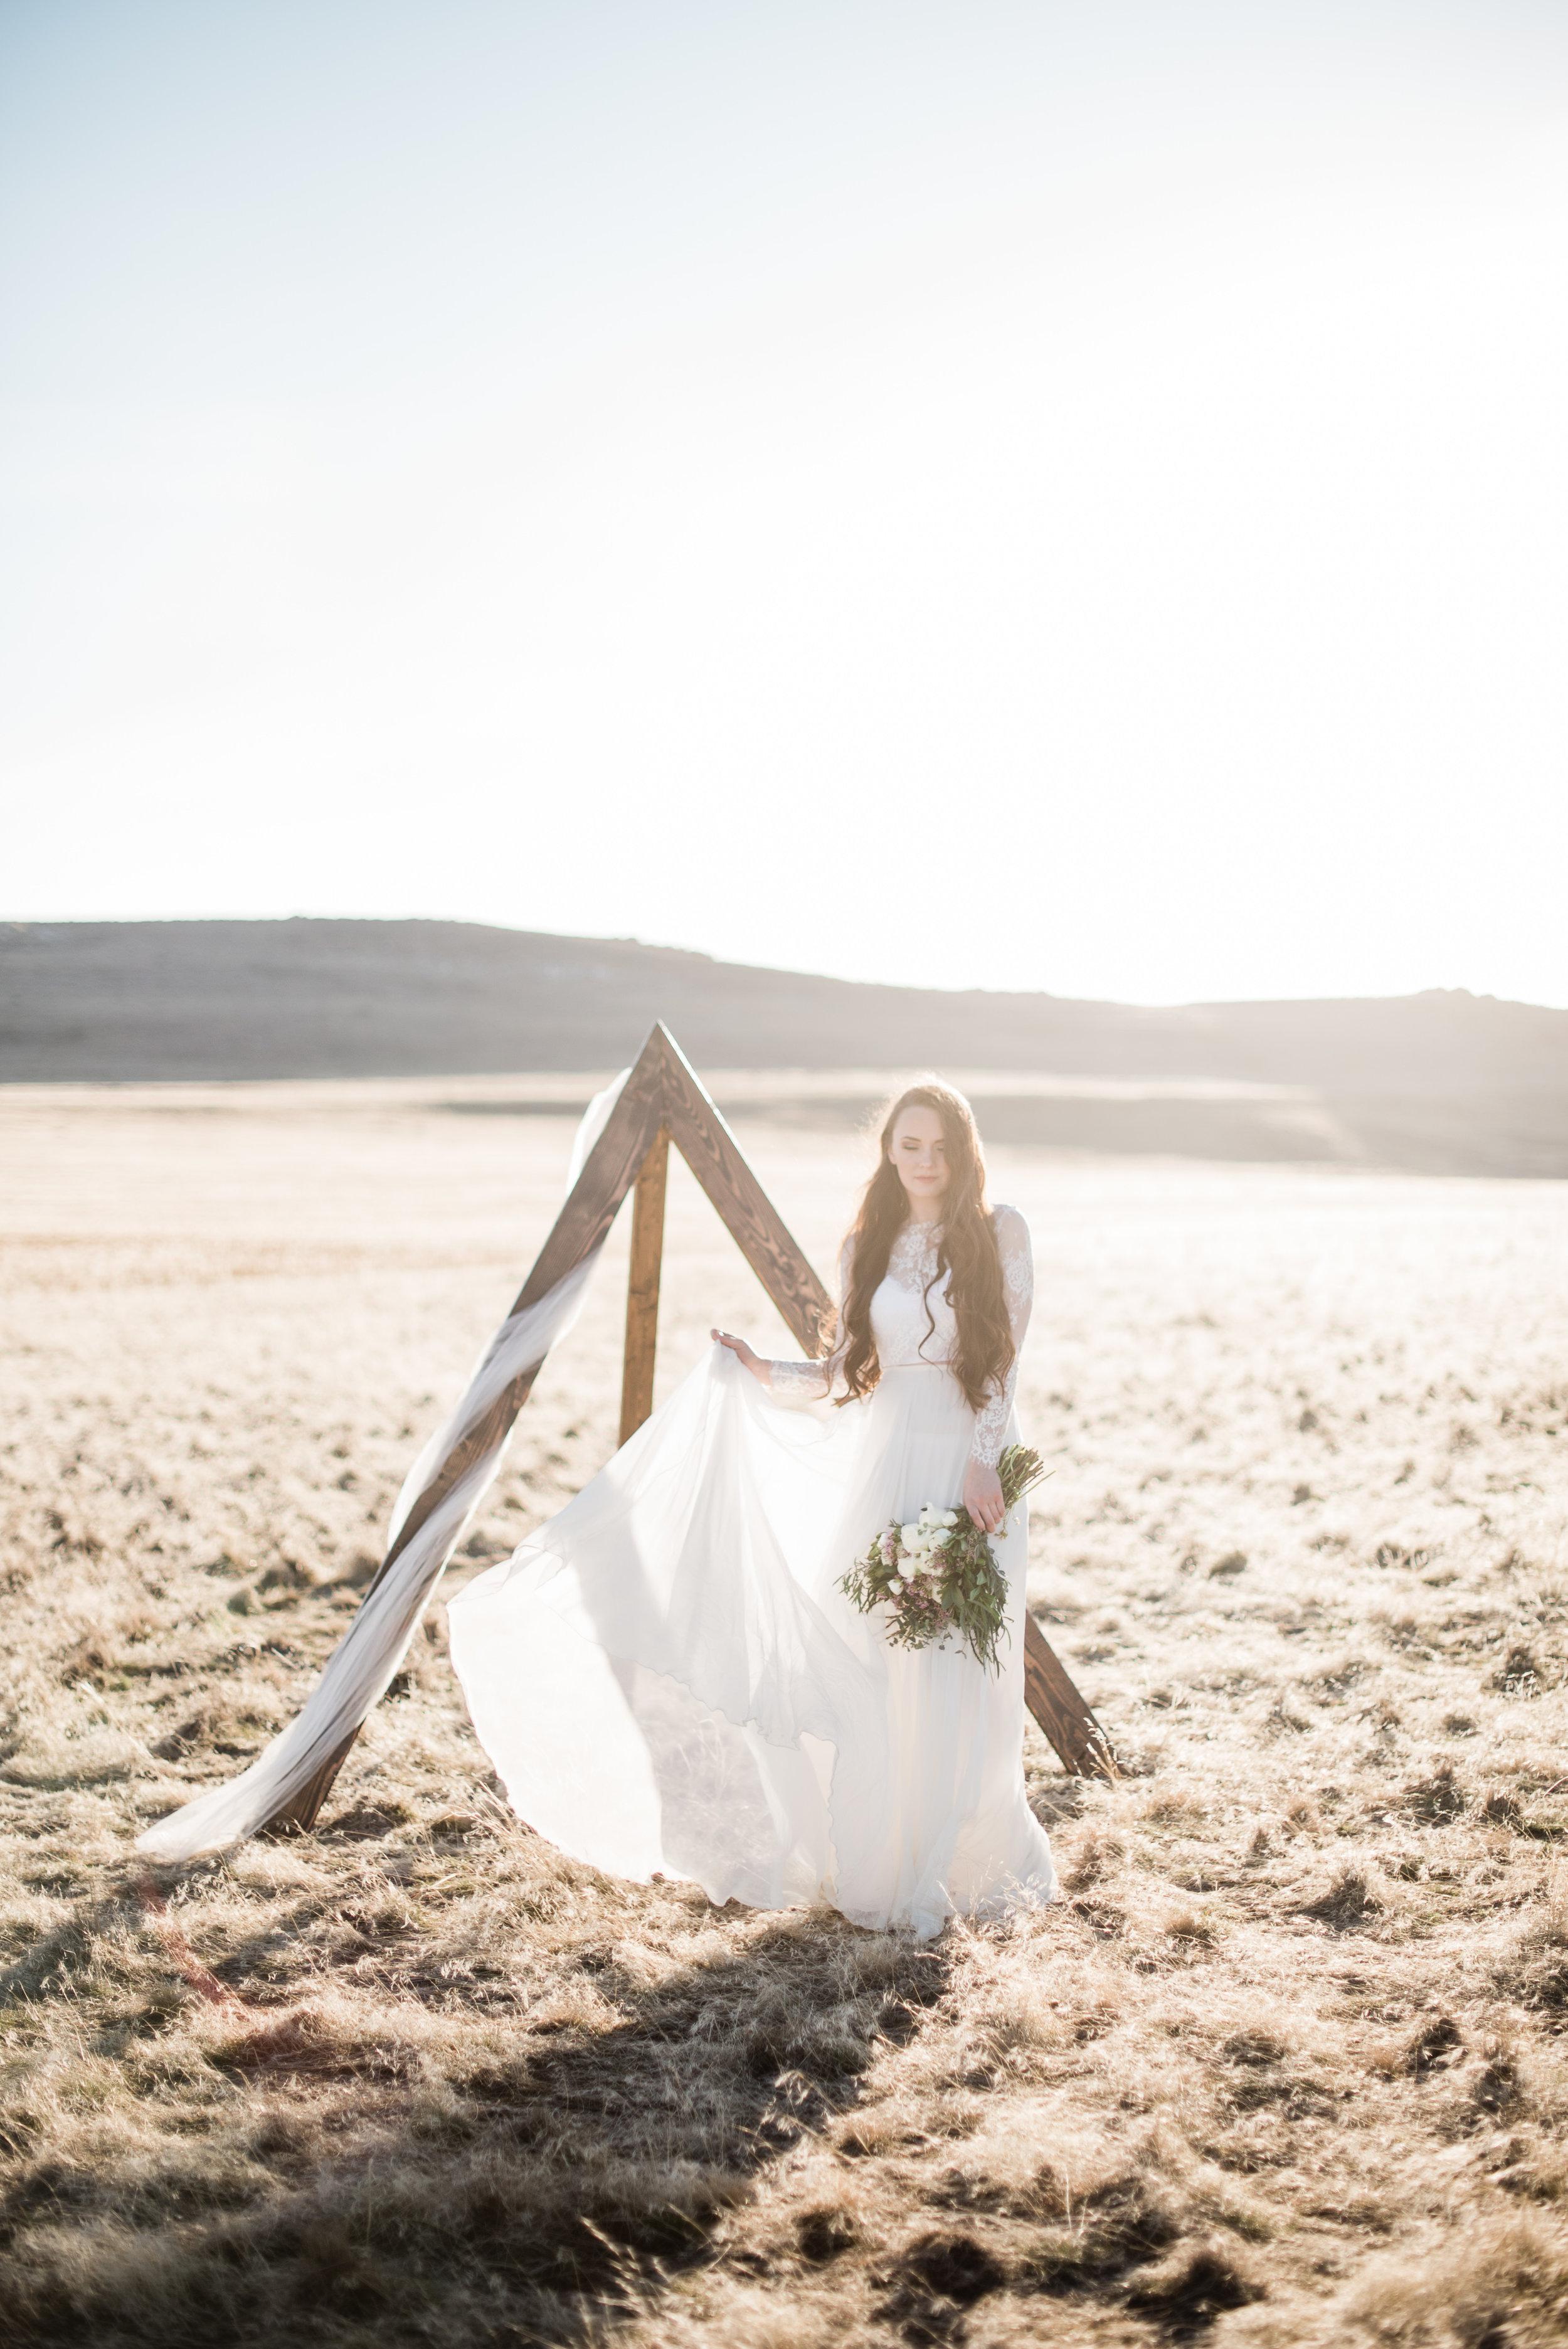 Credits:  Location: Salt Lake City, Utah Photographer: @brynleepaigephotography Harper top and lilly skirt: @gypsybride Mua: @taliawhatcottmua Model:@kaitlyn_gardner Florals: @harperfloral Frame:@brynleenjensen